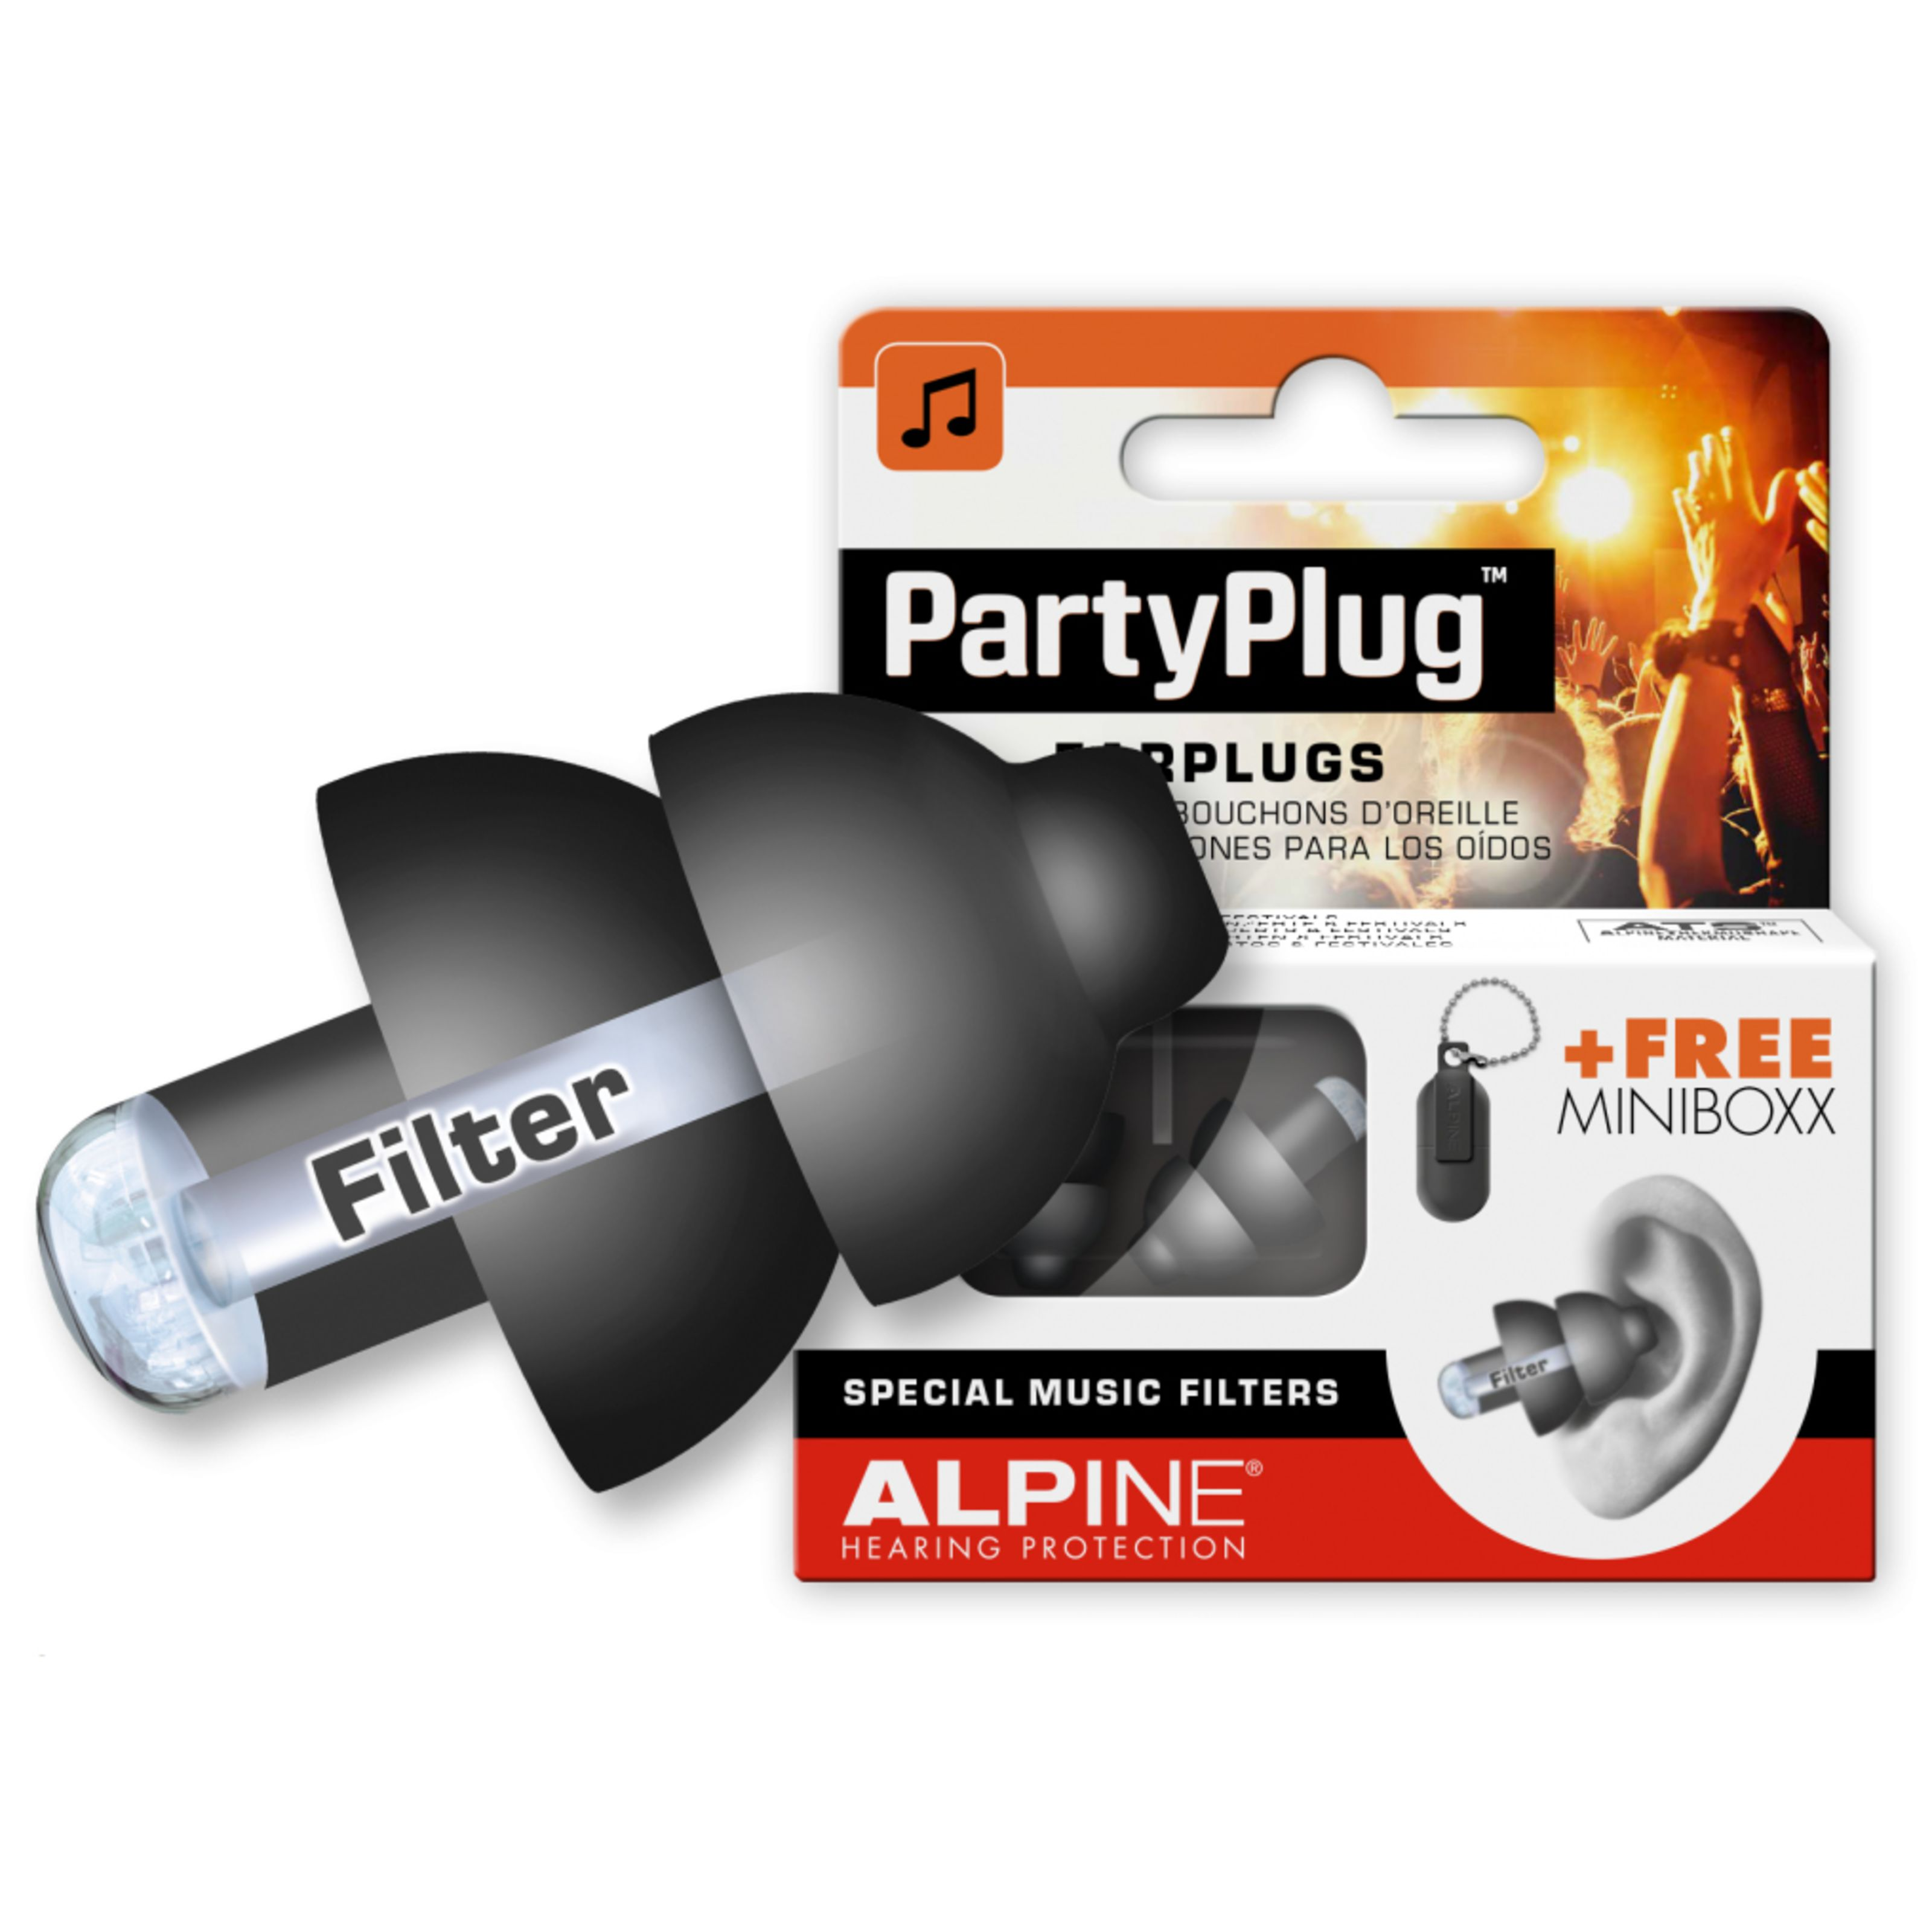 Alpine - PartyPlug Gehörschutz, Black 111.21.652